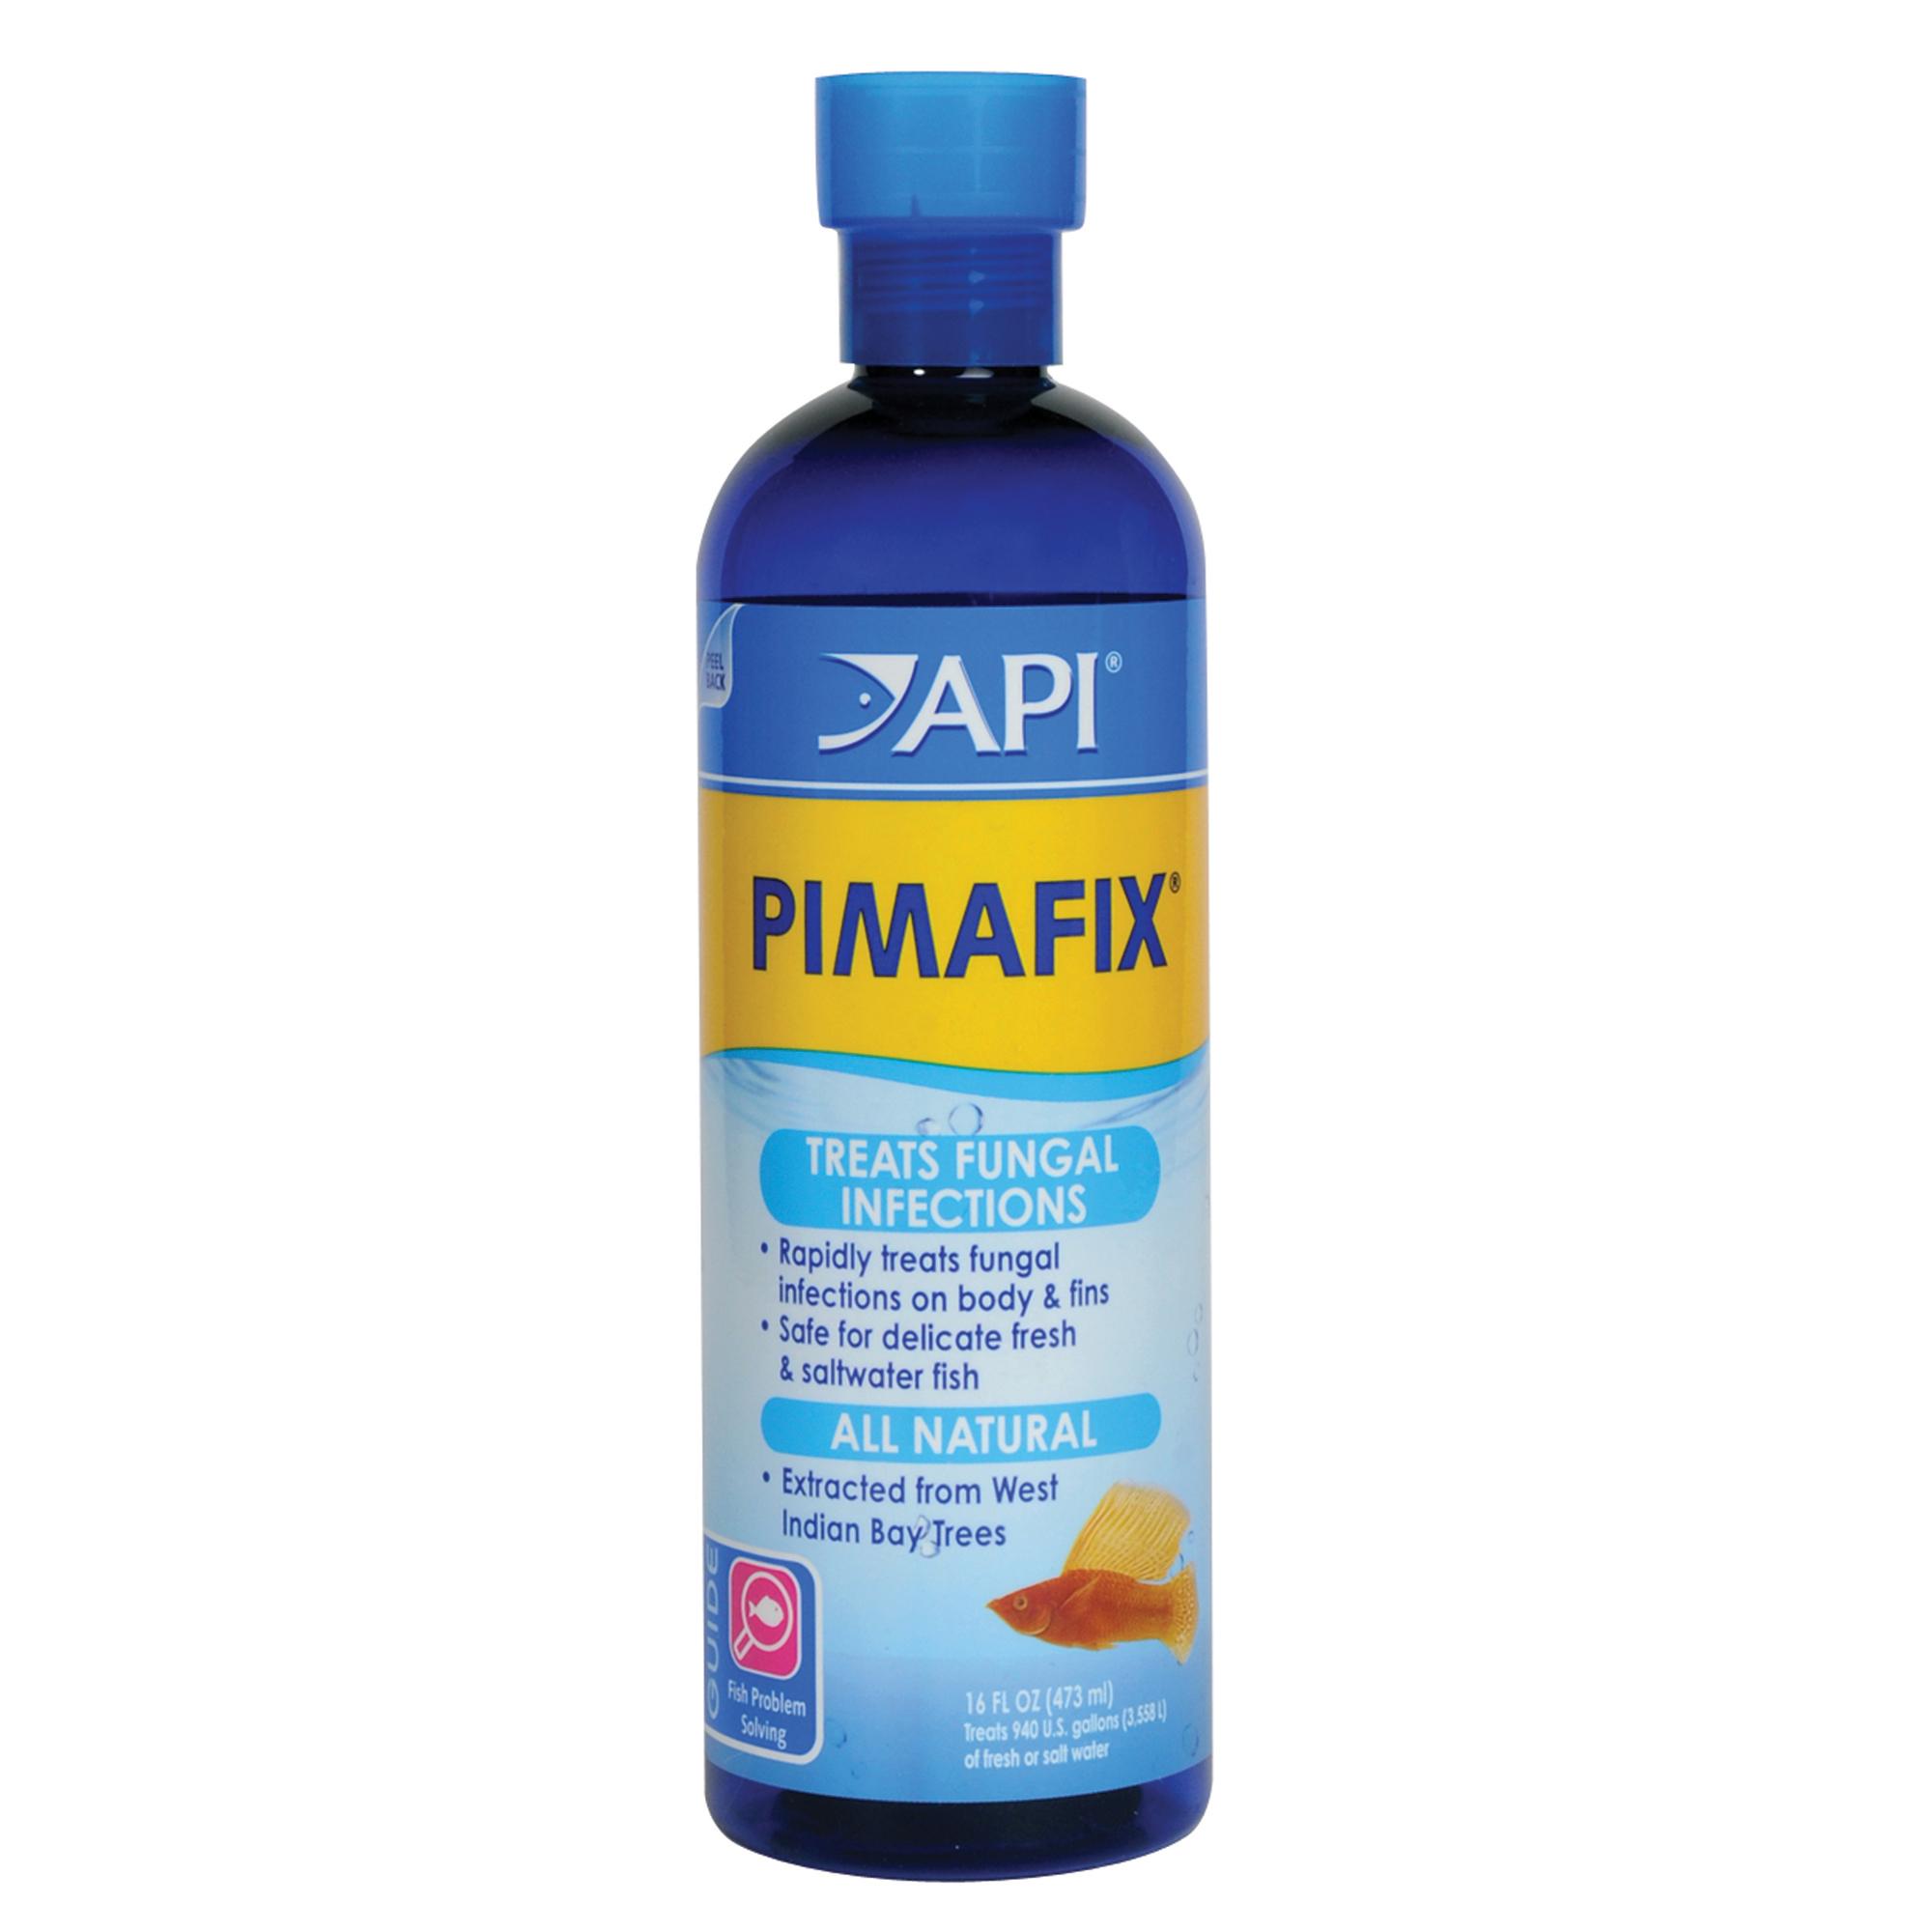 PIMAFIX™